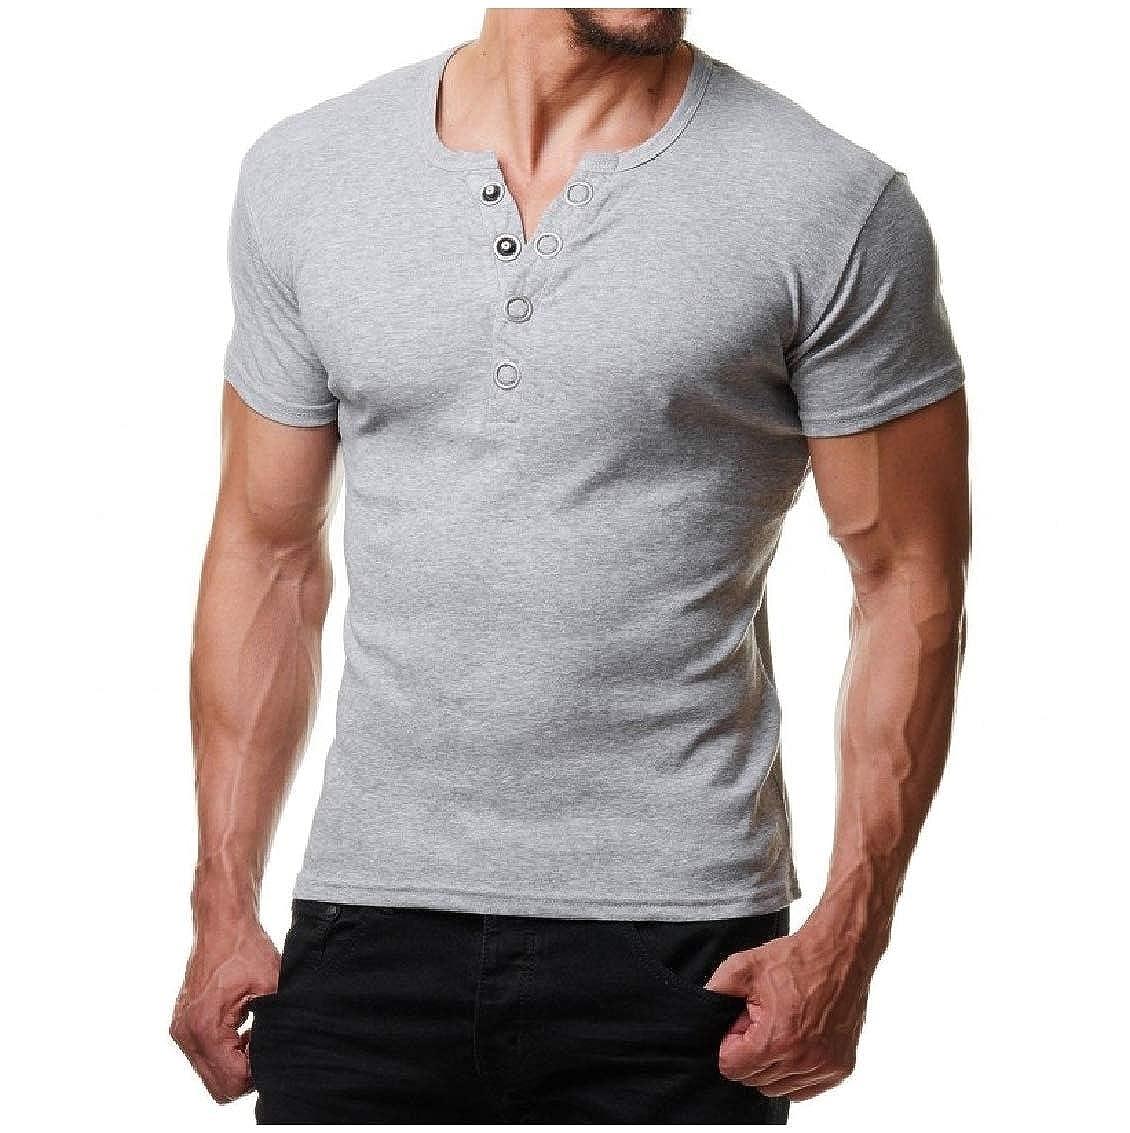 Freely Mens Athletic Leisure Short Sleeve Plus Size Shirts T-Shirt